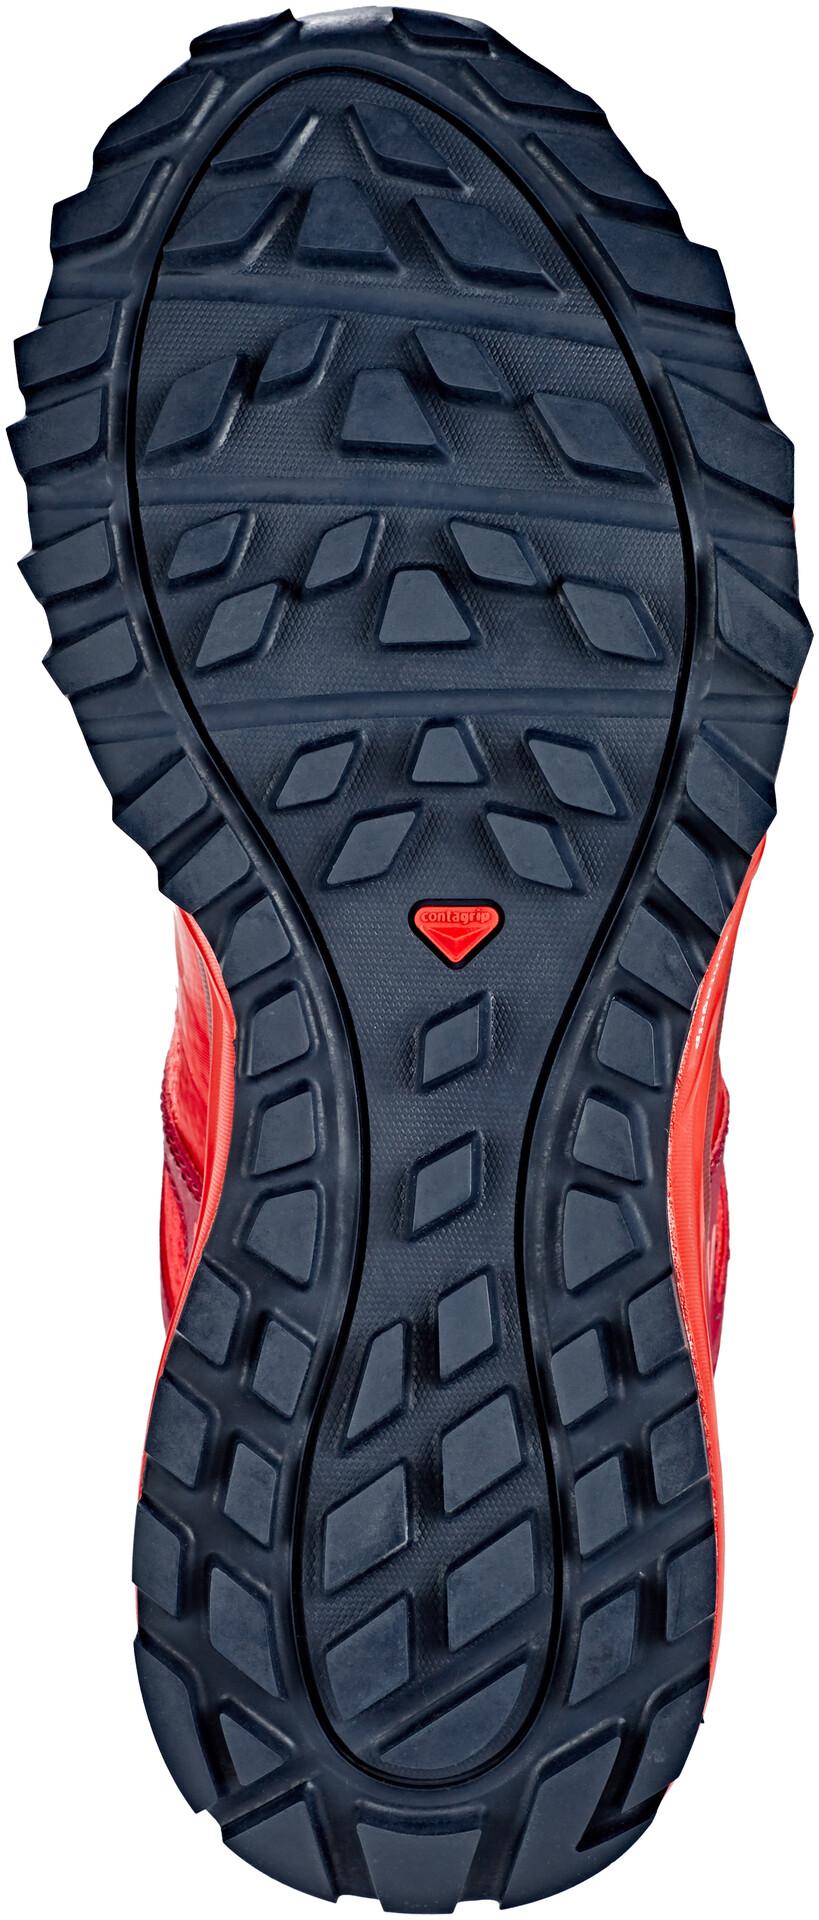 Salomon Trailster GTX Shoes Damen hibiscusbeet redgraphite